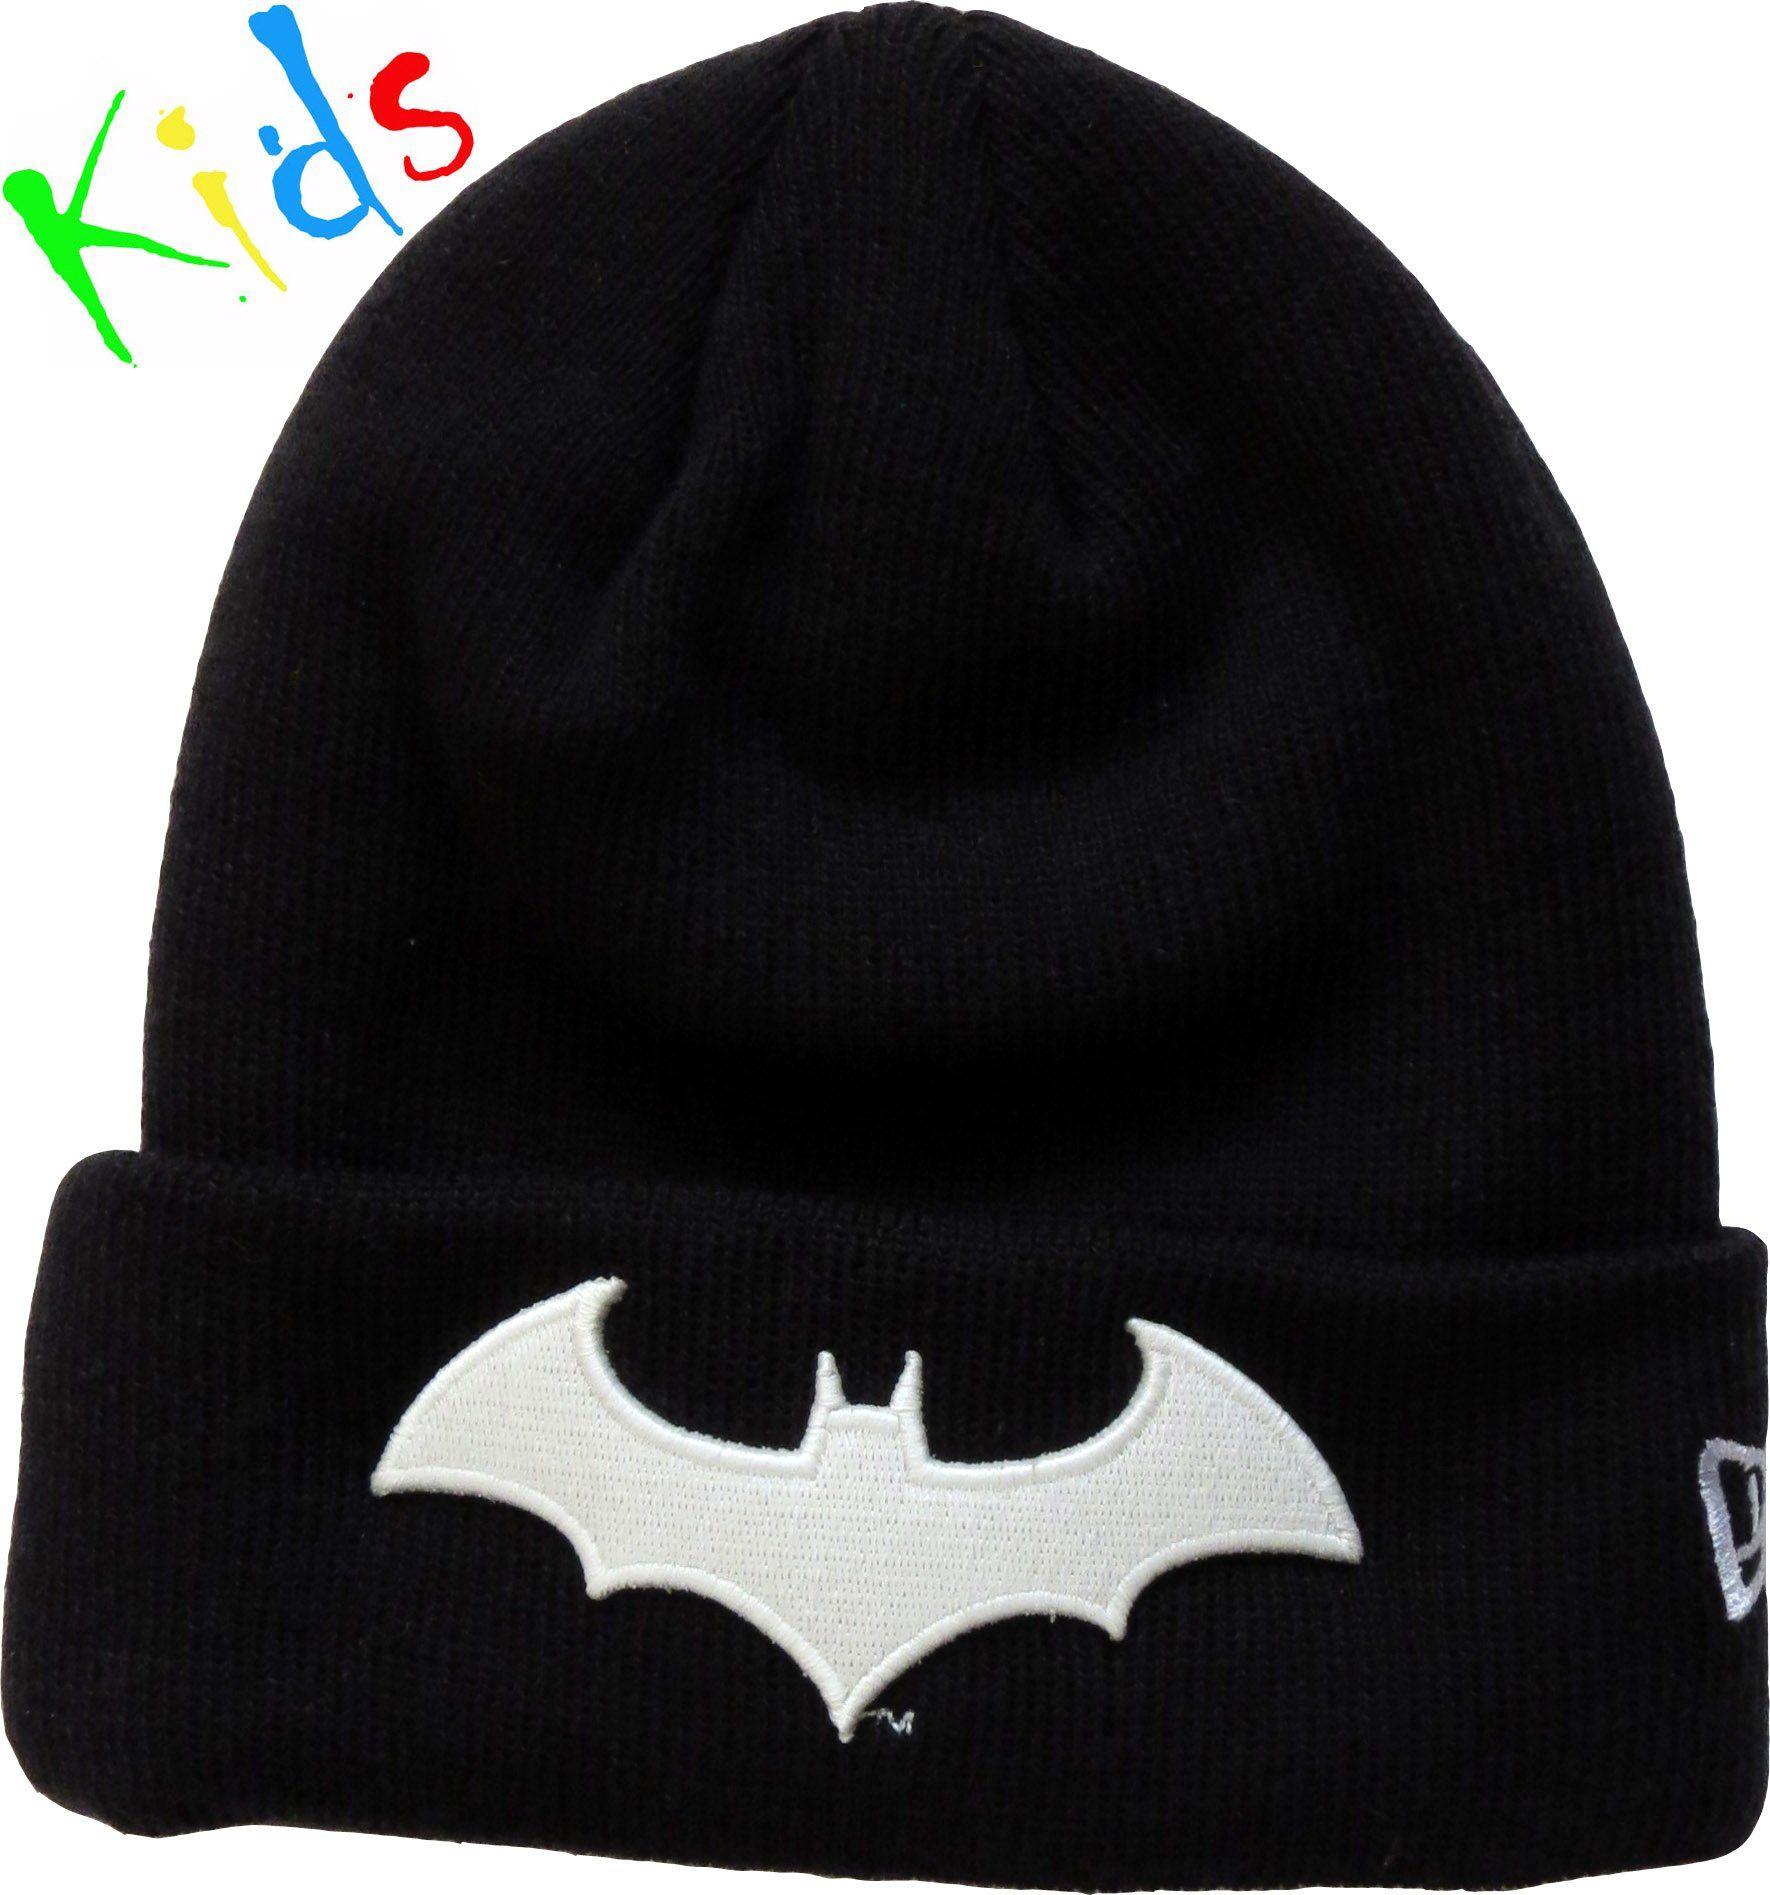 fadc5a7b4b7 New Era Kids NBA Glow In The Dark Character Beanie. Black with the Batman